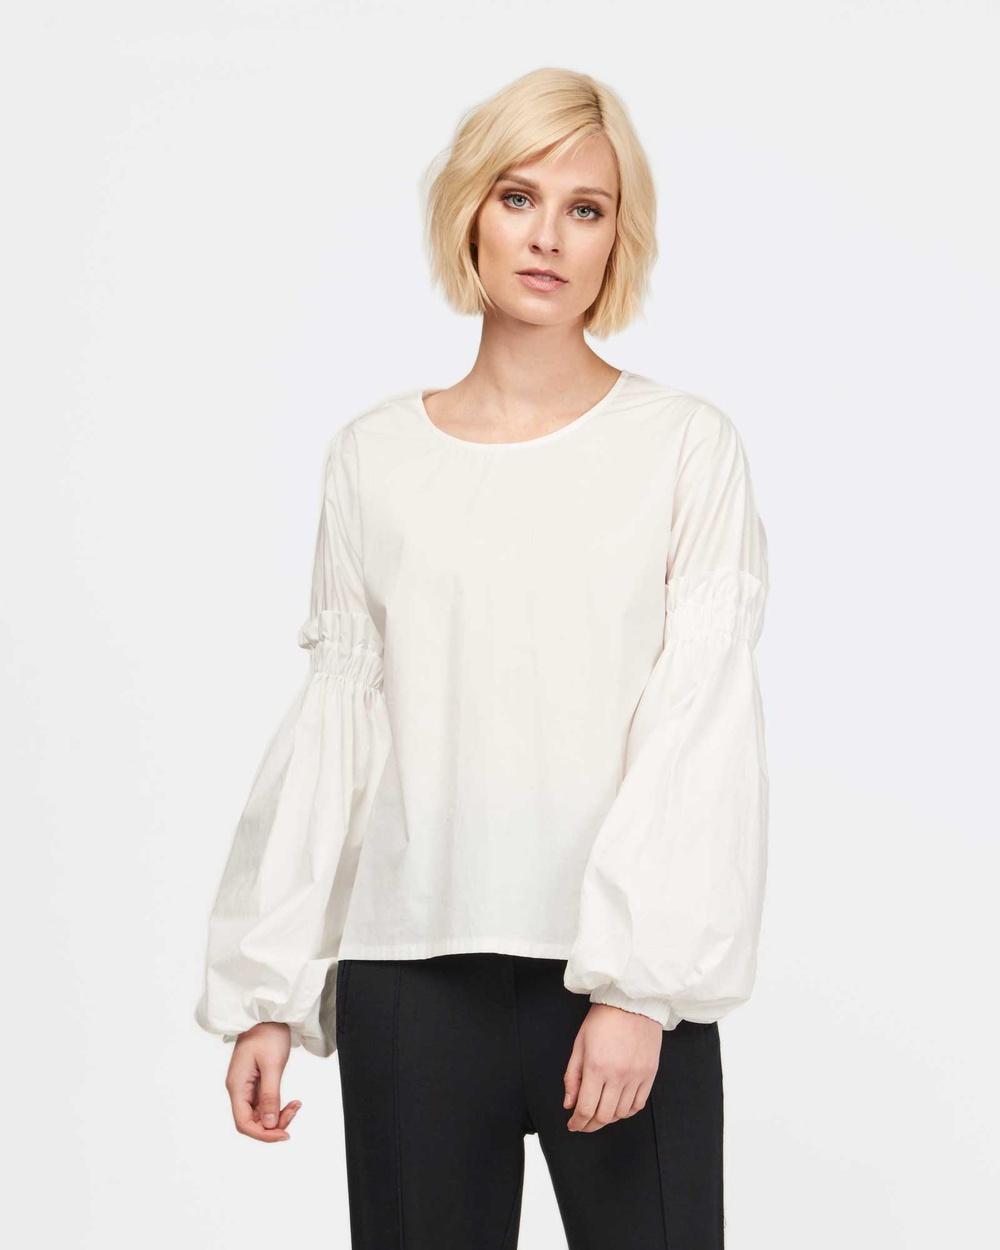 MVN The Writing Room Shirt Tops White The Writing Room Shirt